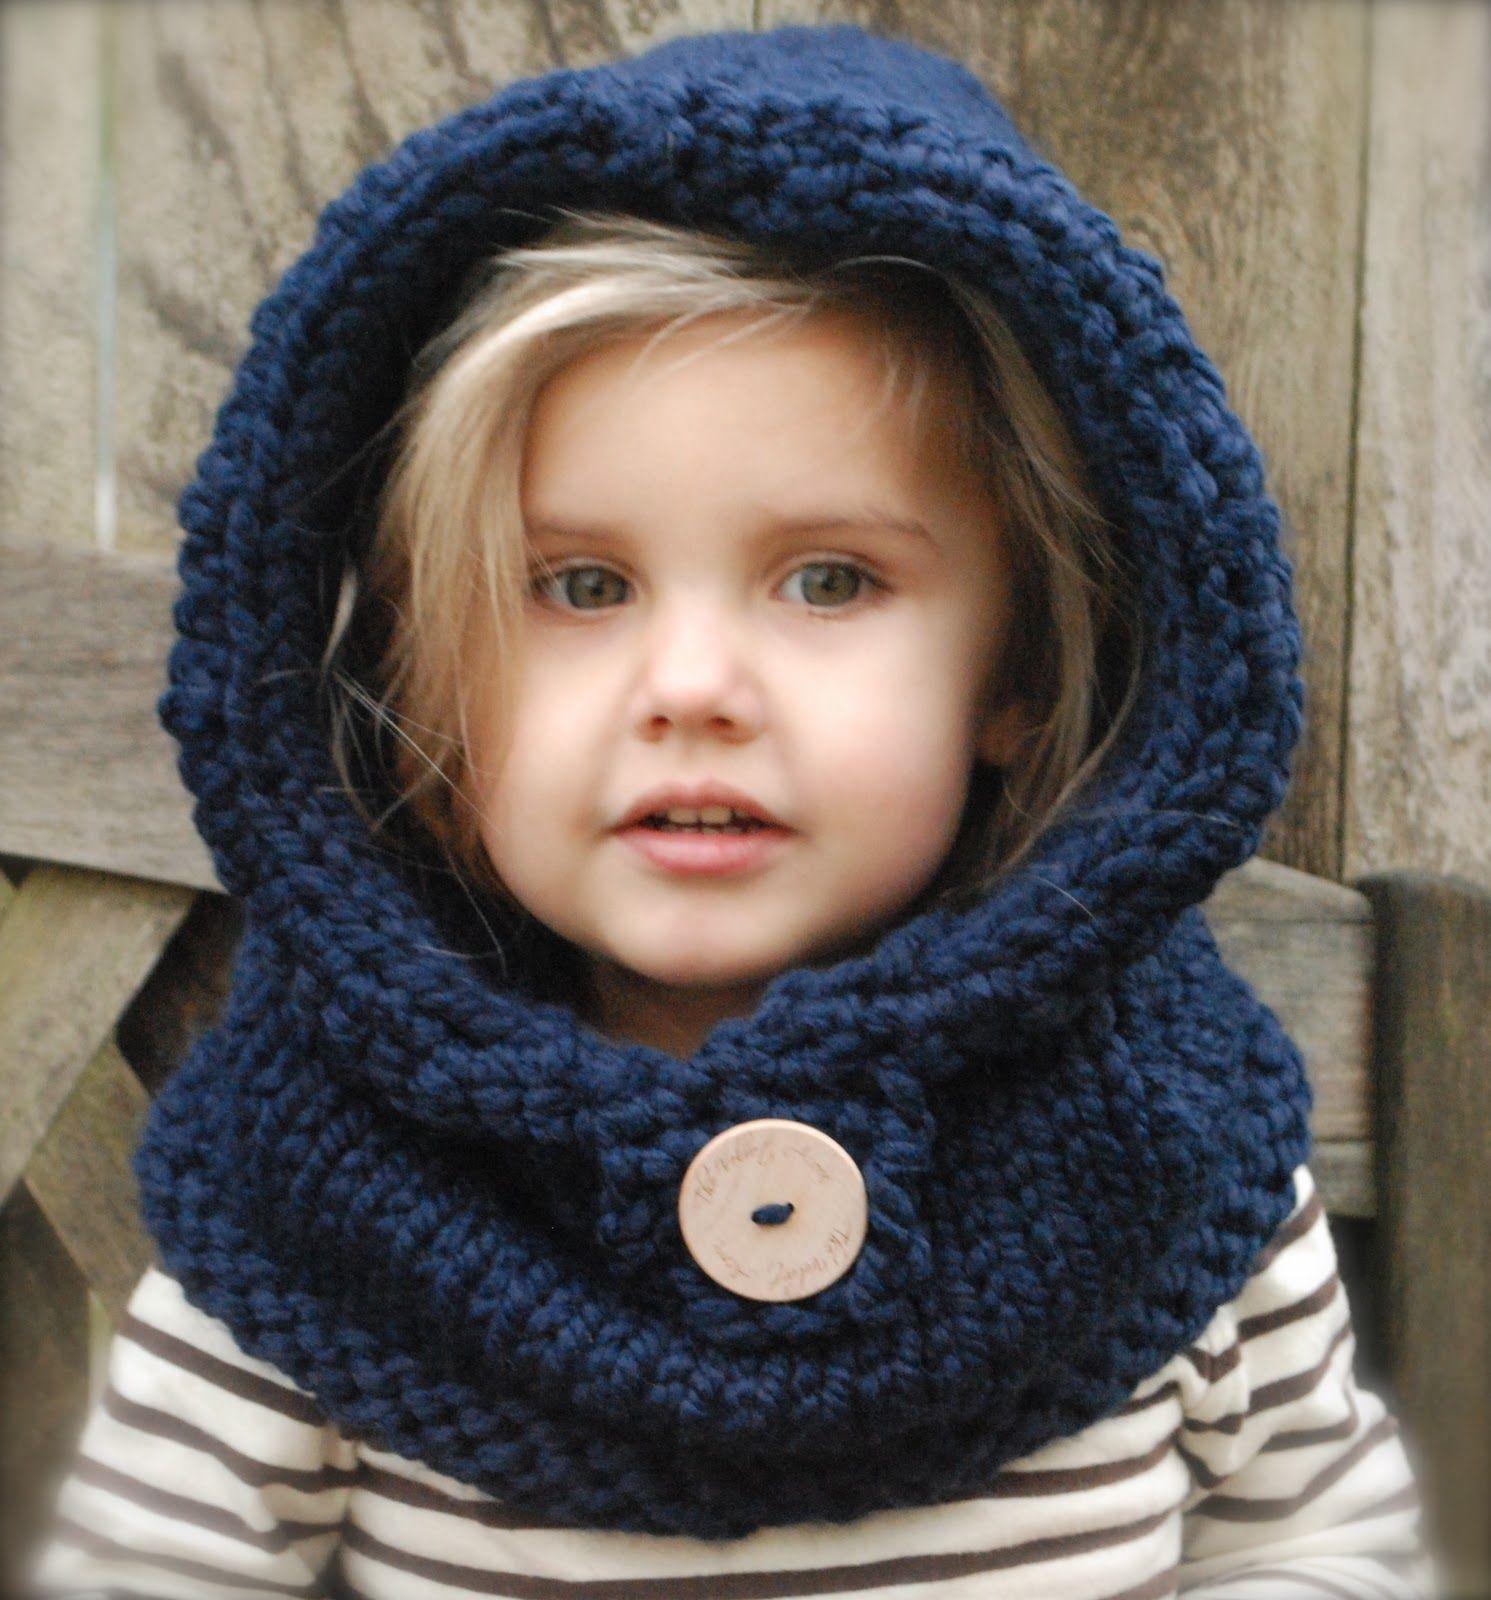 Fox Hooded Cowl Crochet Pattern | Knit cowl, Crochet and Crafty